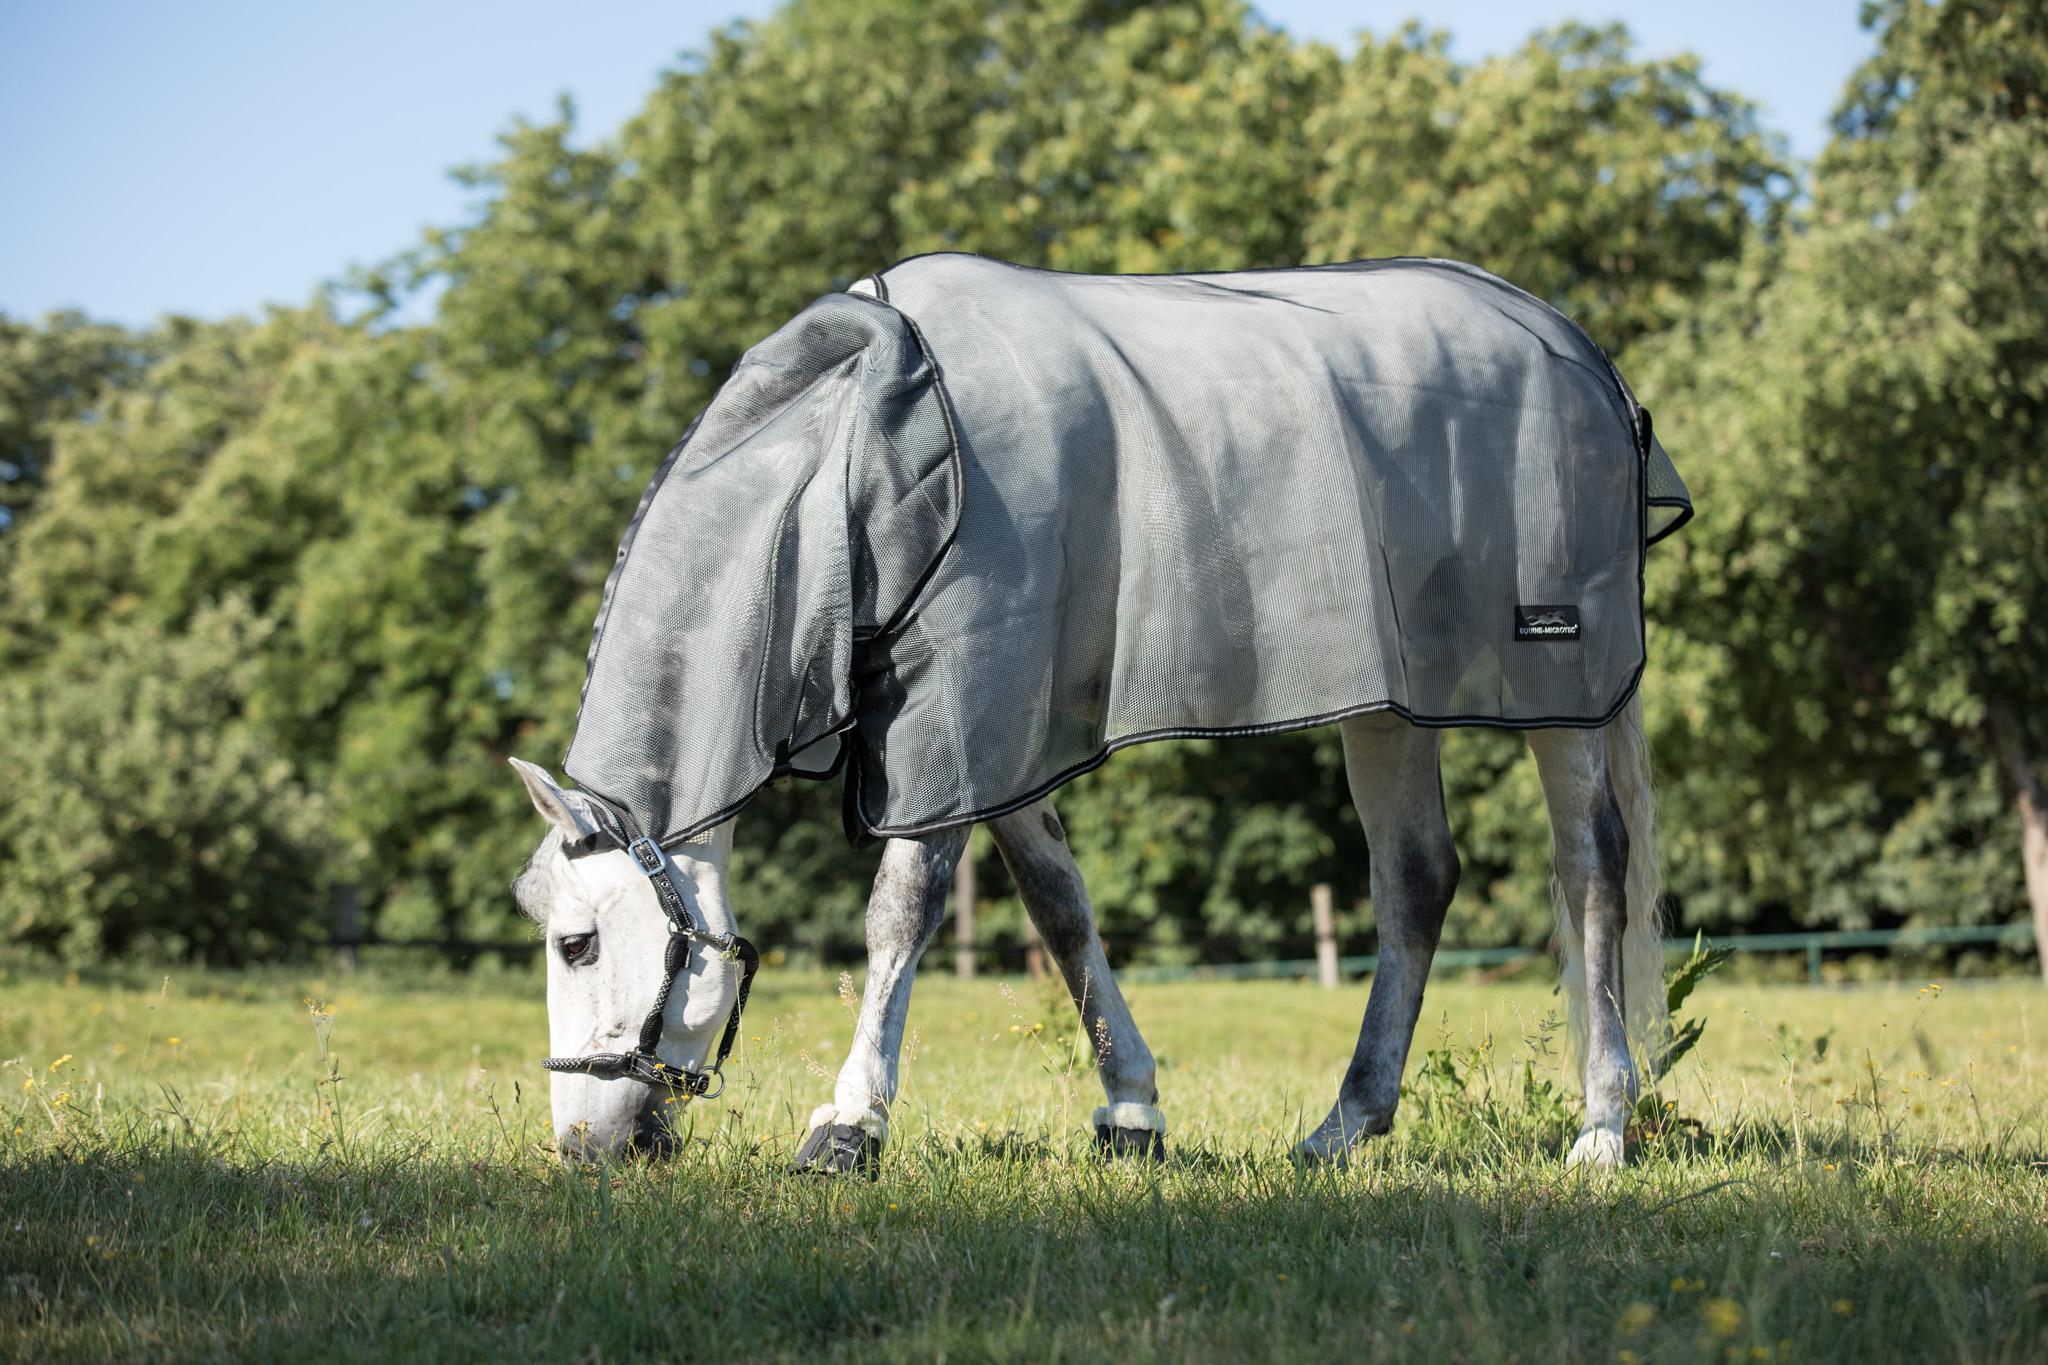 equine-microtec-marvin-vroomen-200601-FS193995wRFNxCZw37FVR